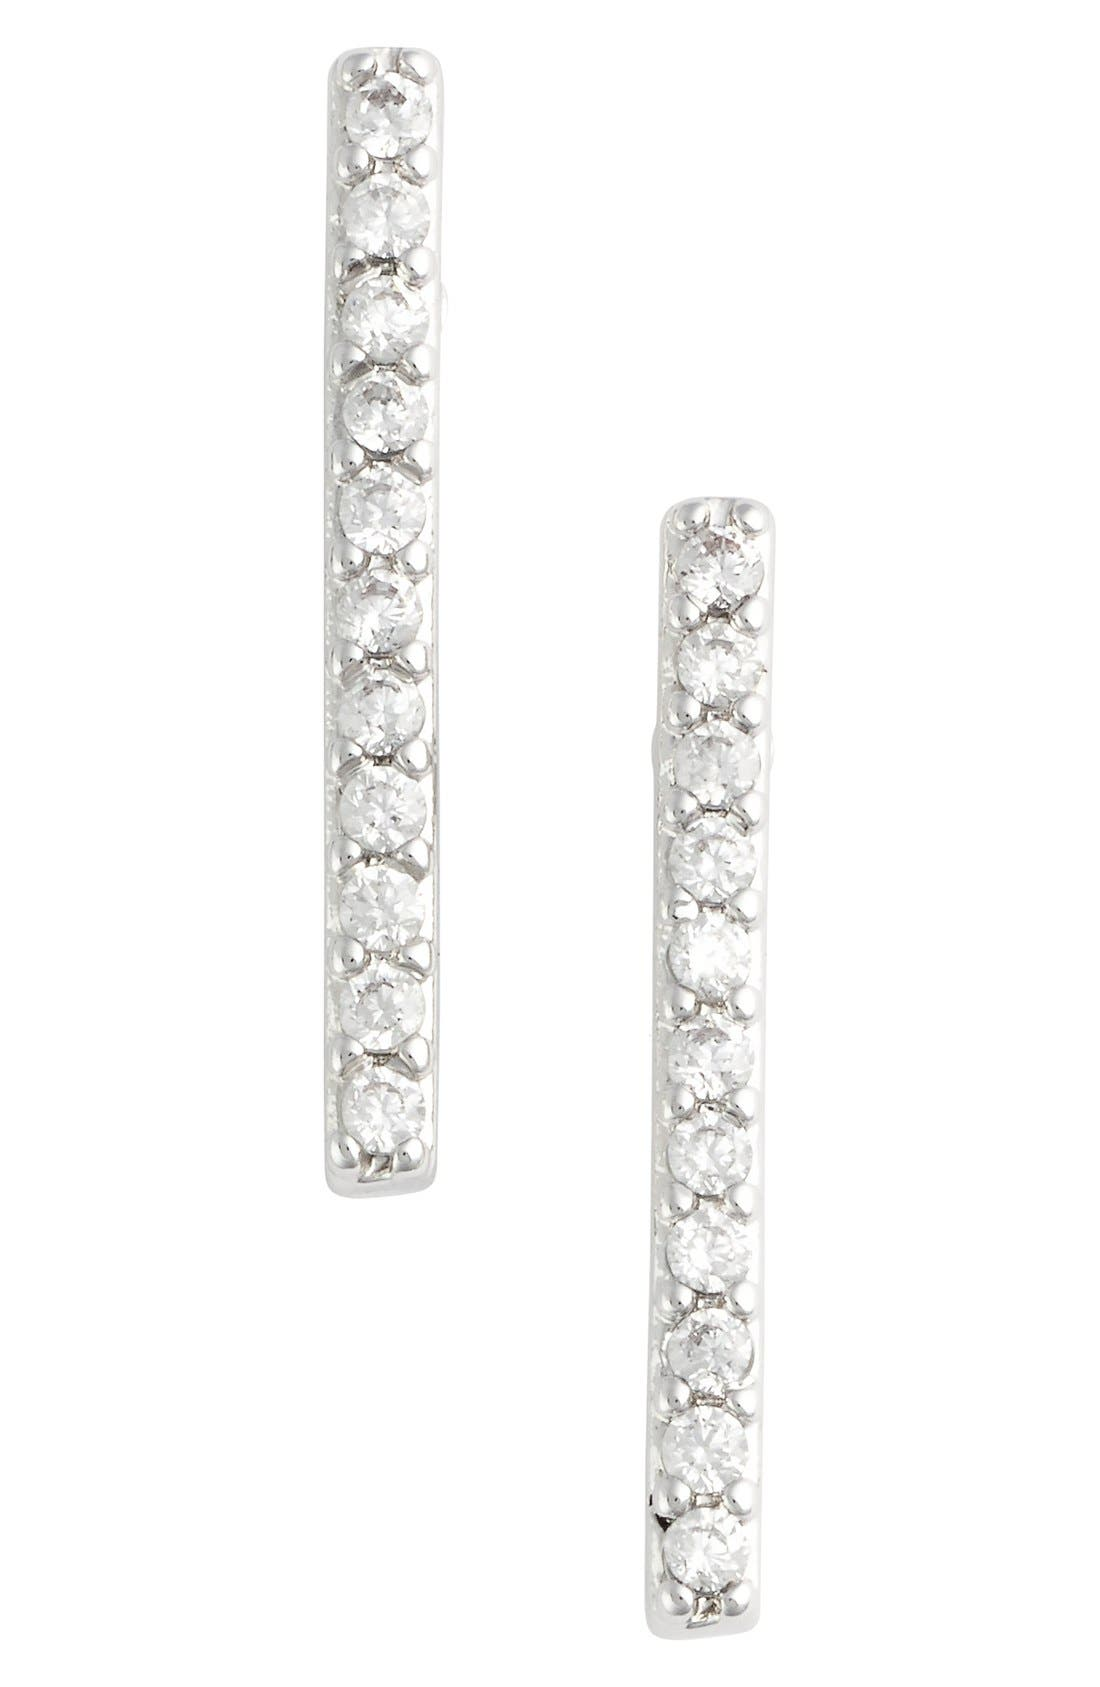 Jules Smith 'Micro' Pavé Bar Stud Earrings